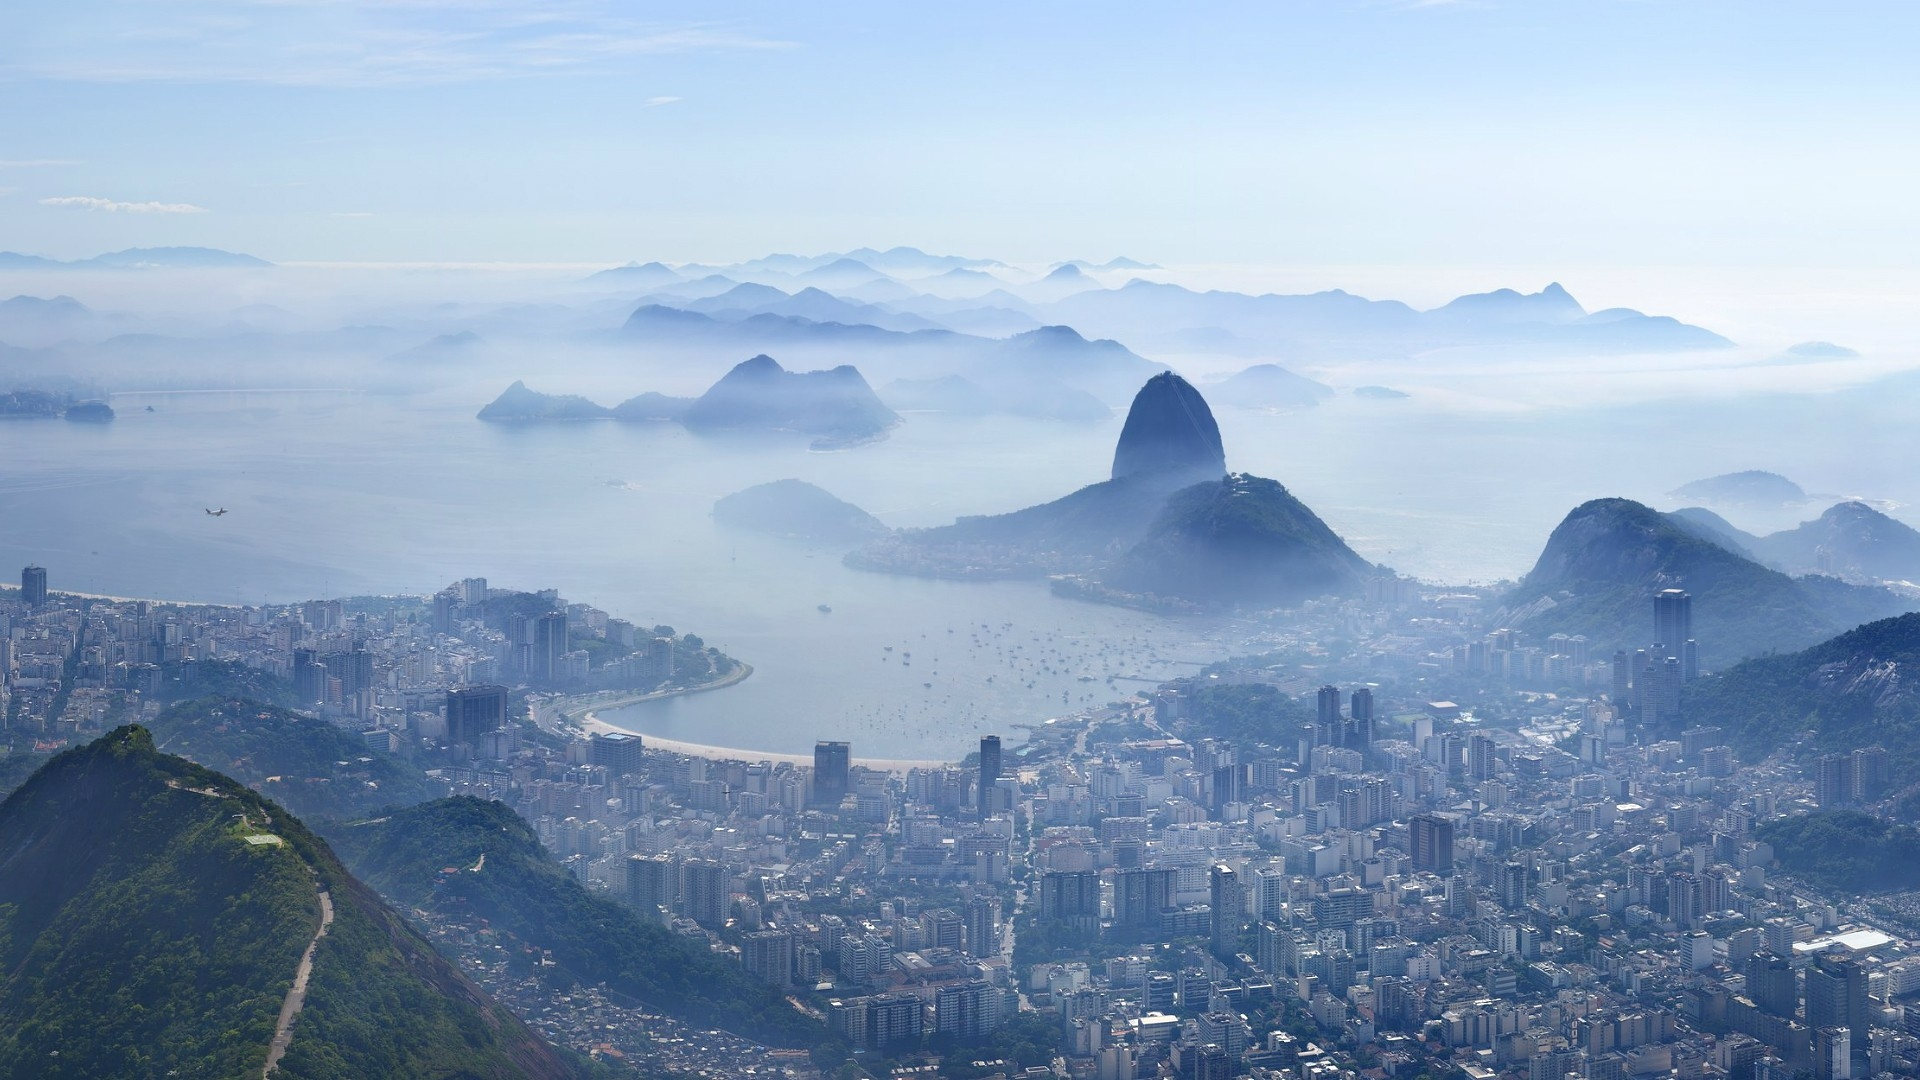 Rio De Janeiro Wallpaper HD Full HD Pictures 1920x1080